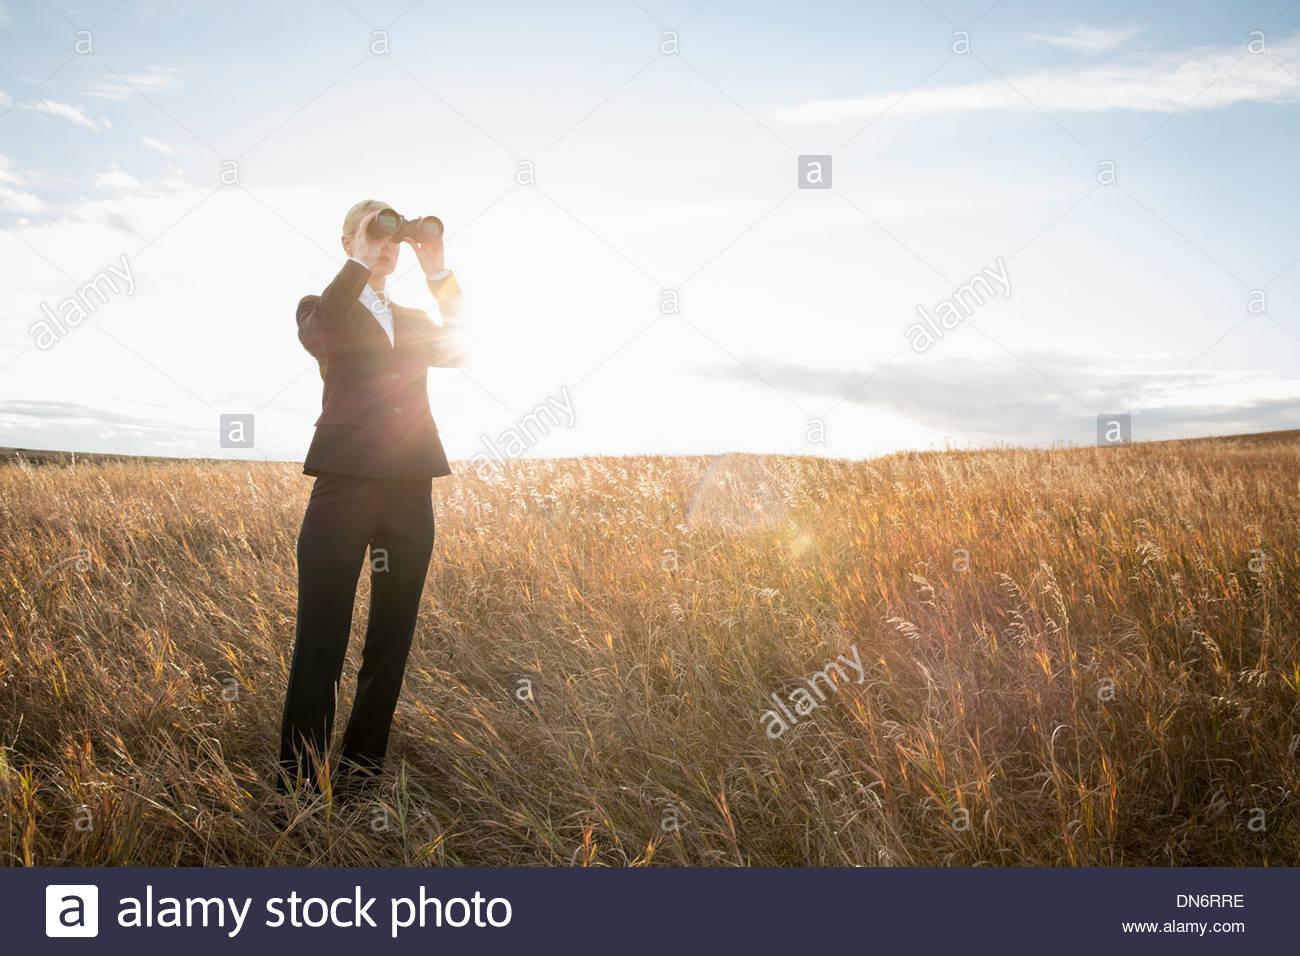 Businesswoman looking through binoculars outdoors - Stock Image